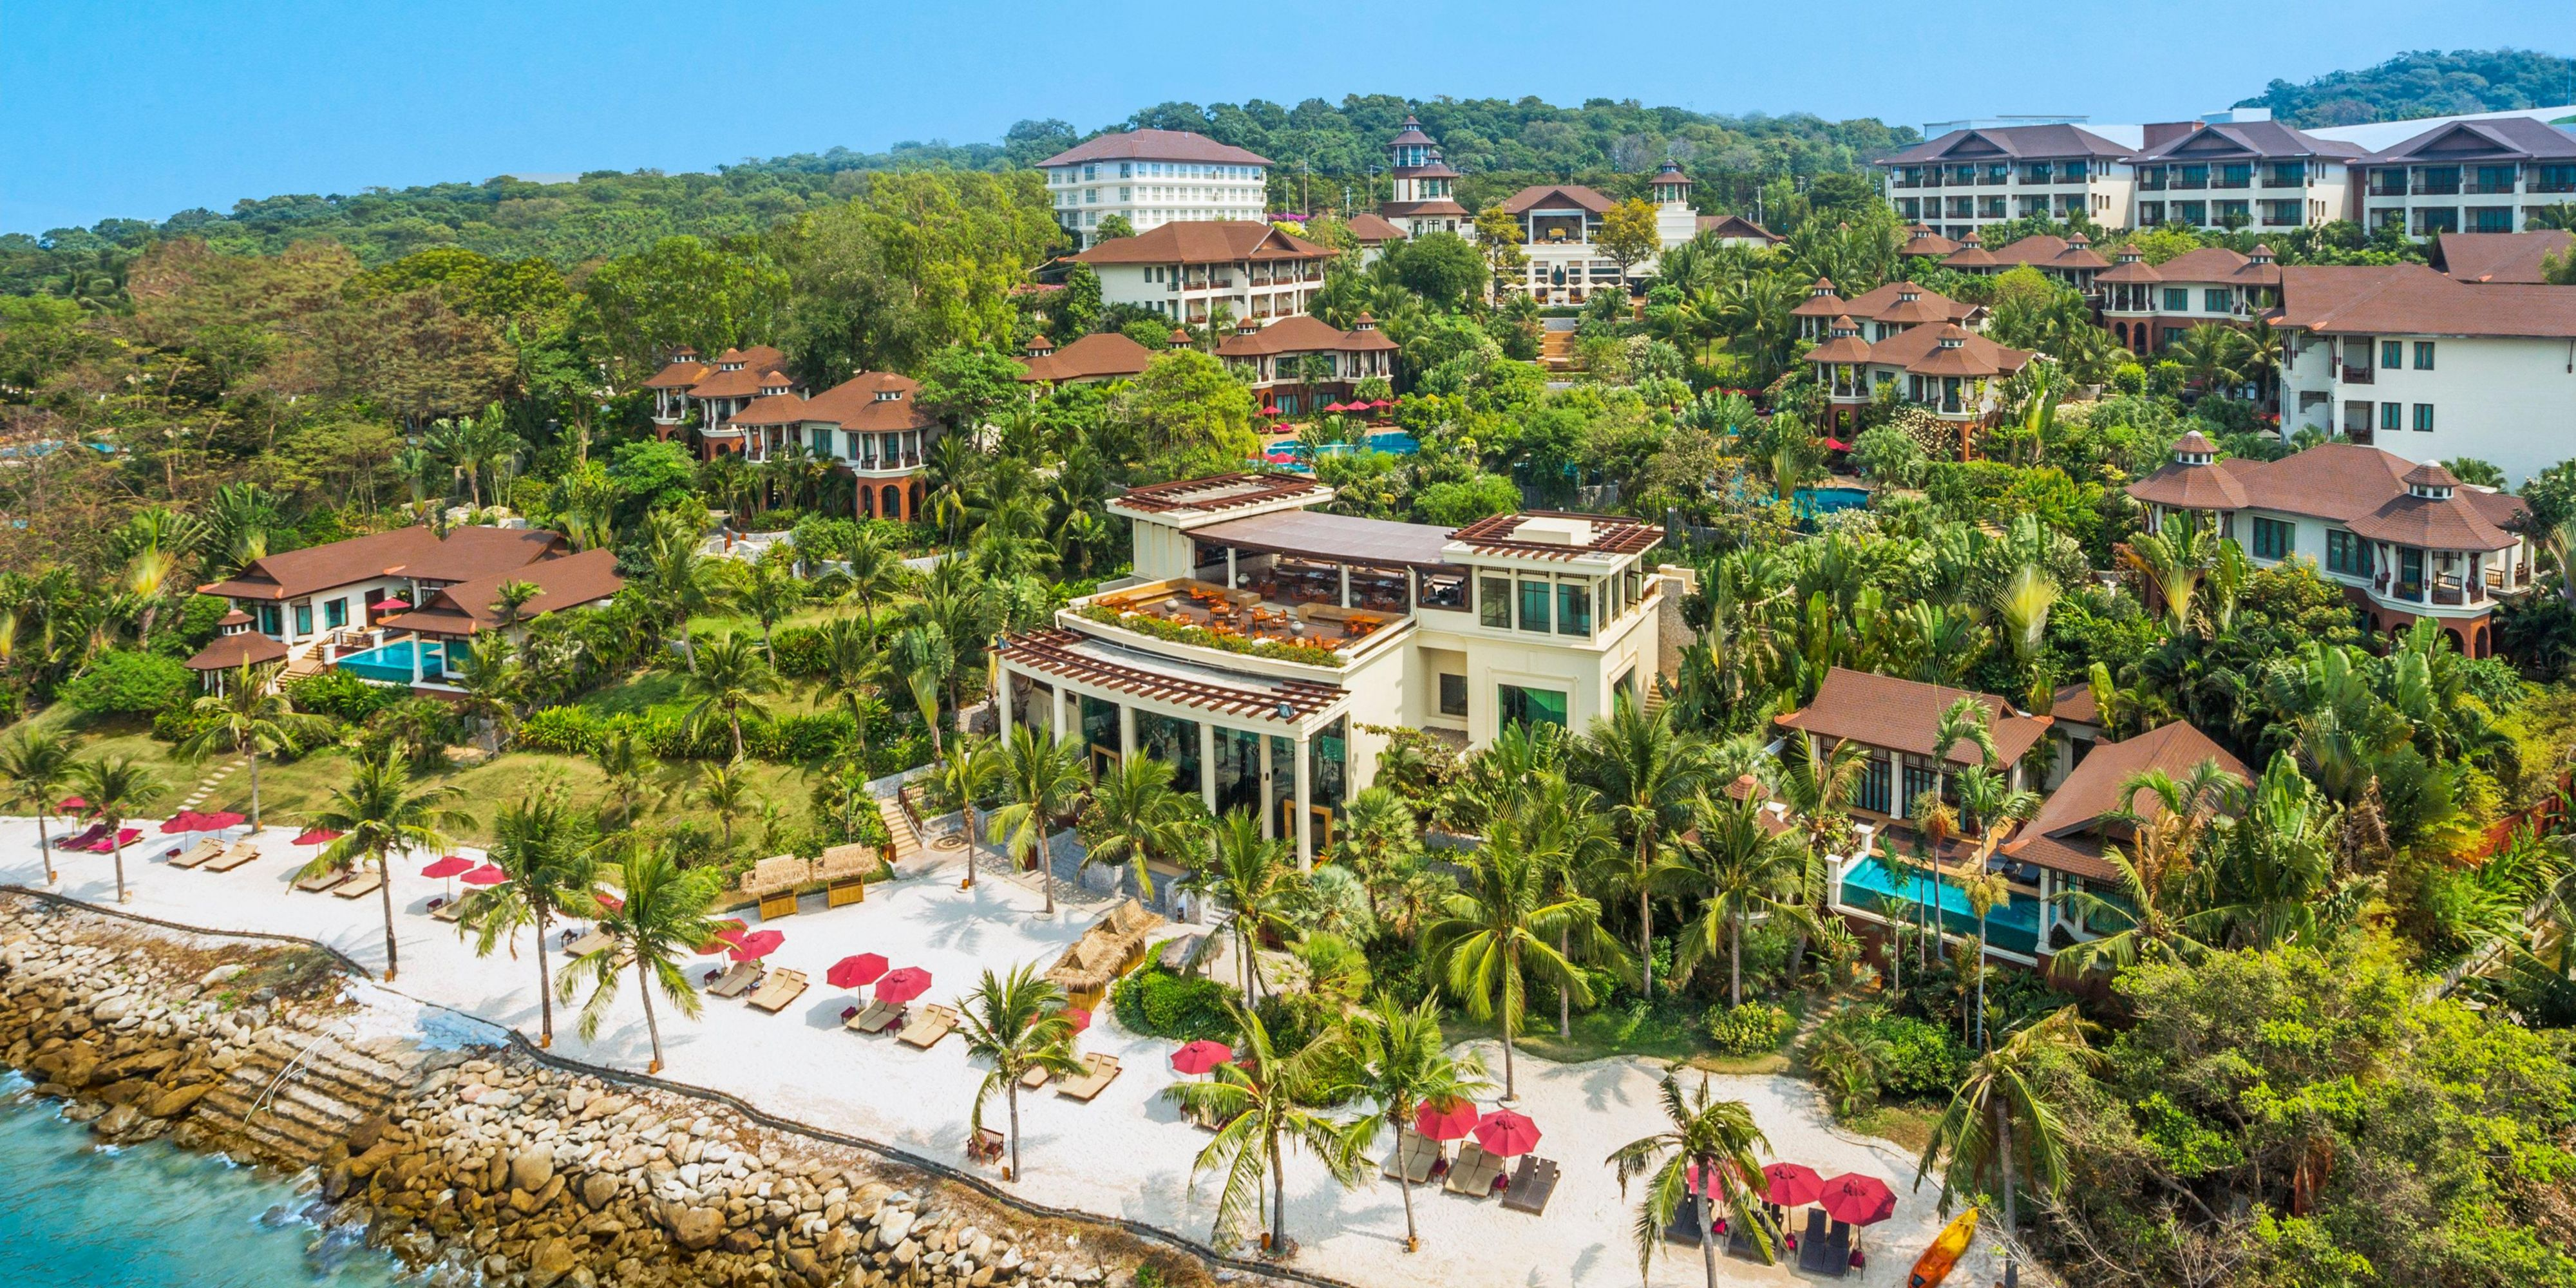 InterContinental Pattaya Resort - Pattaya